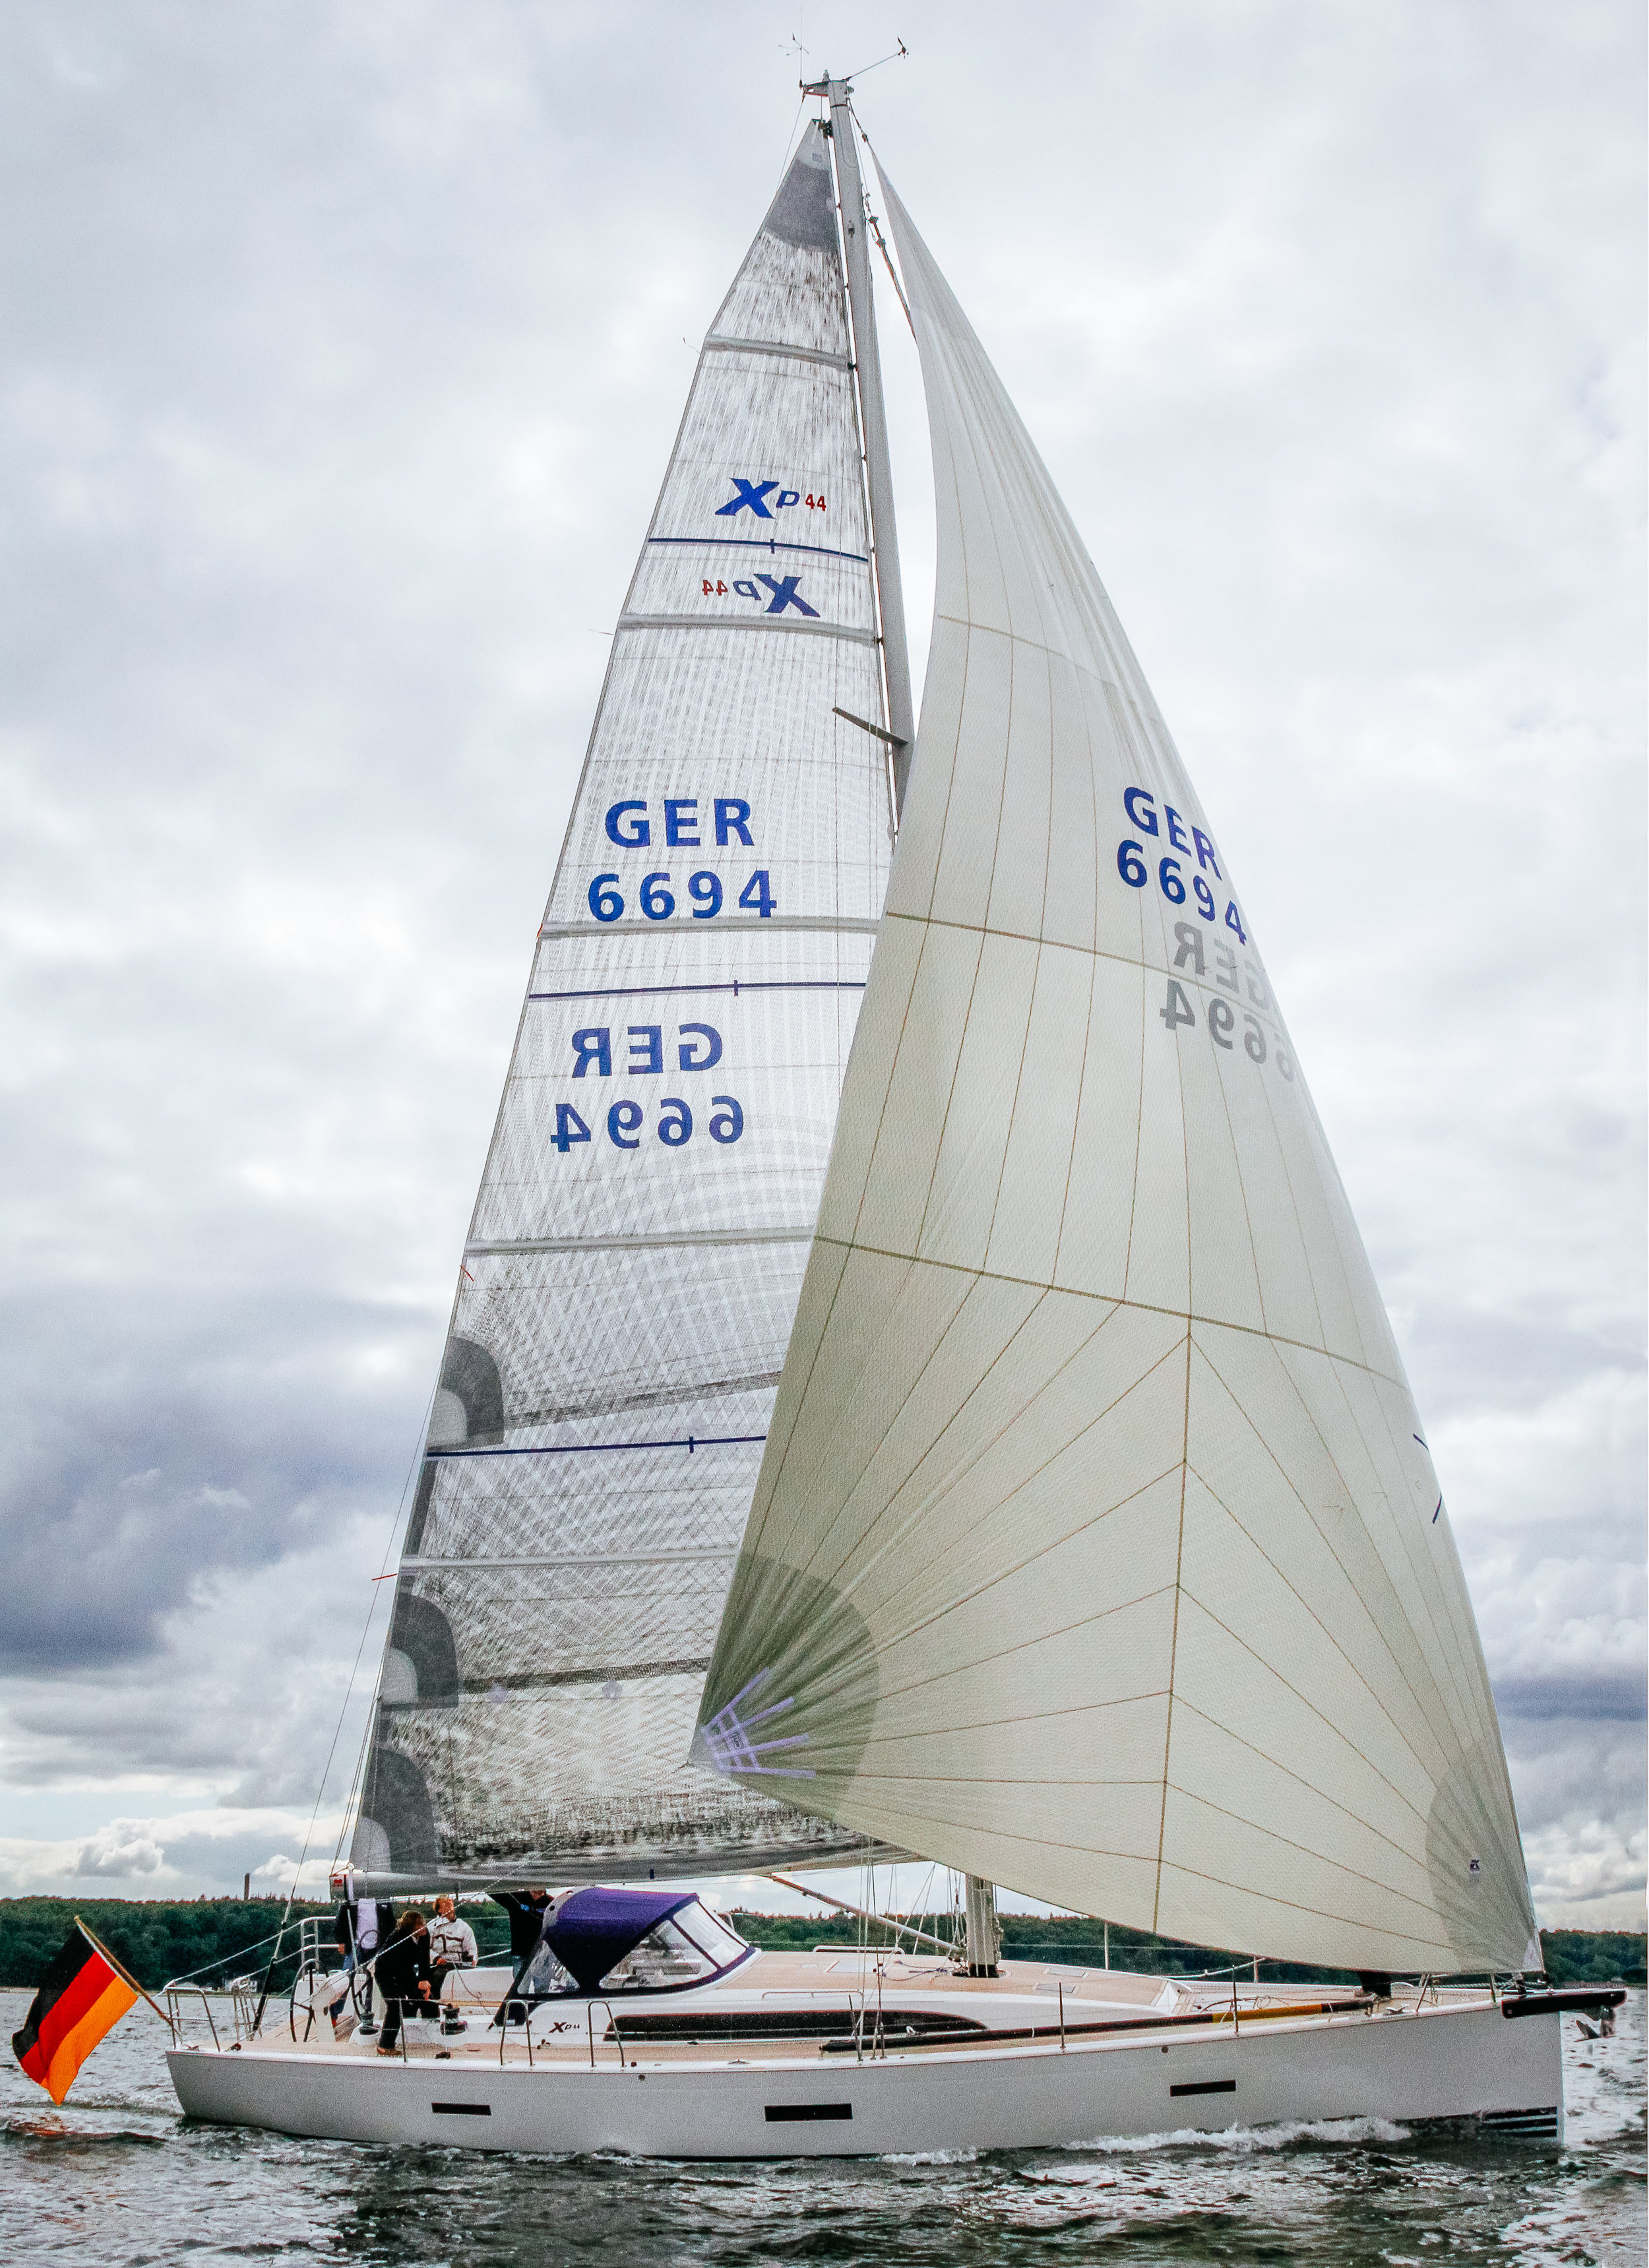 UK Sailmakers XP-44 Code 0